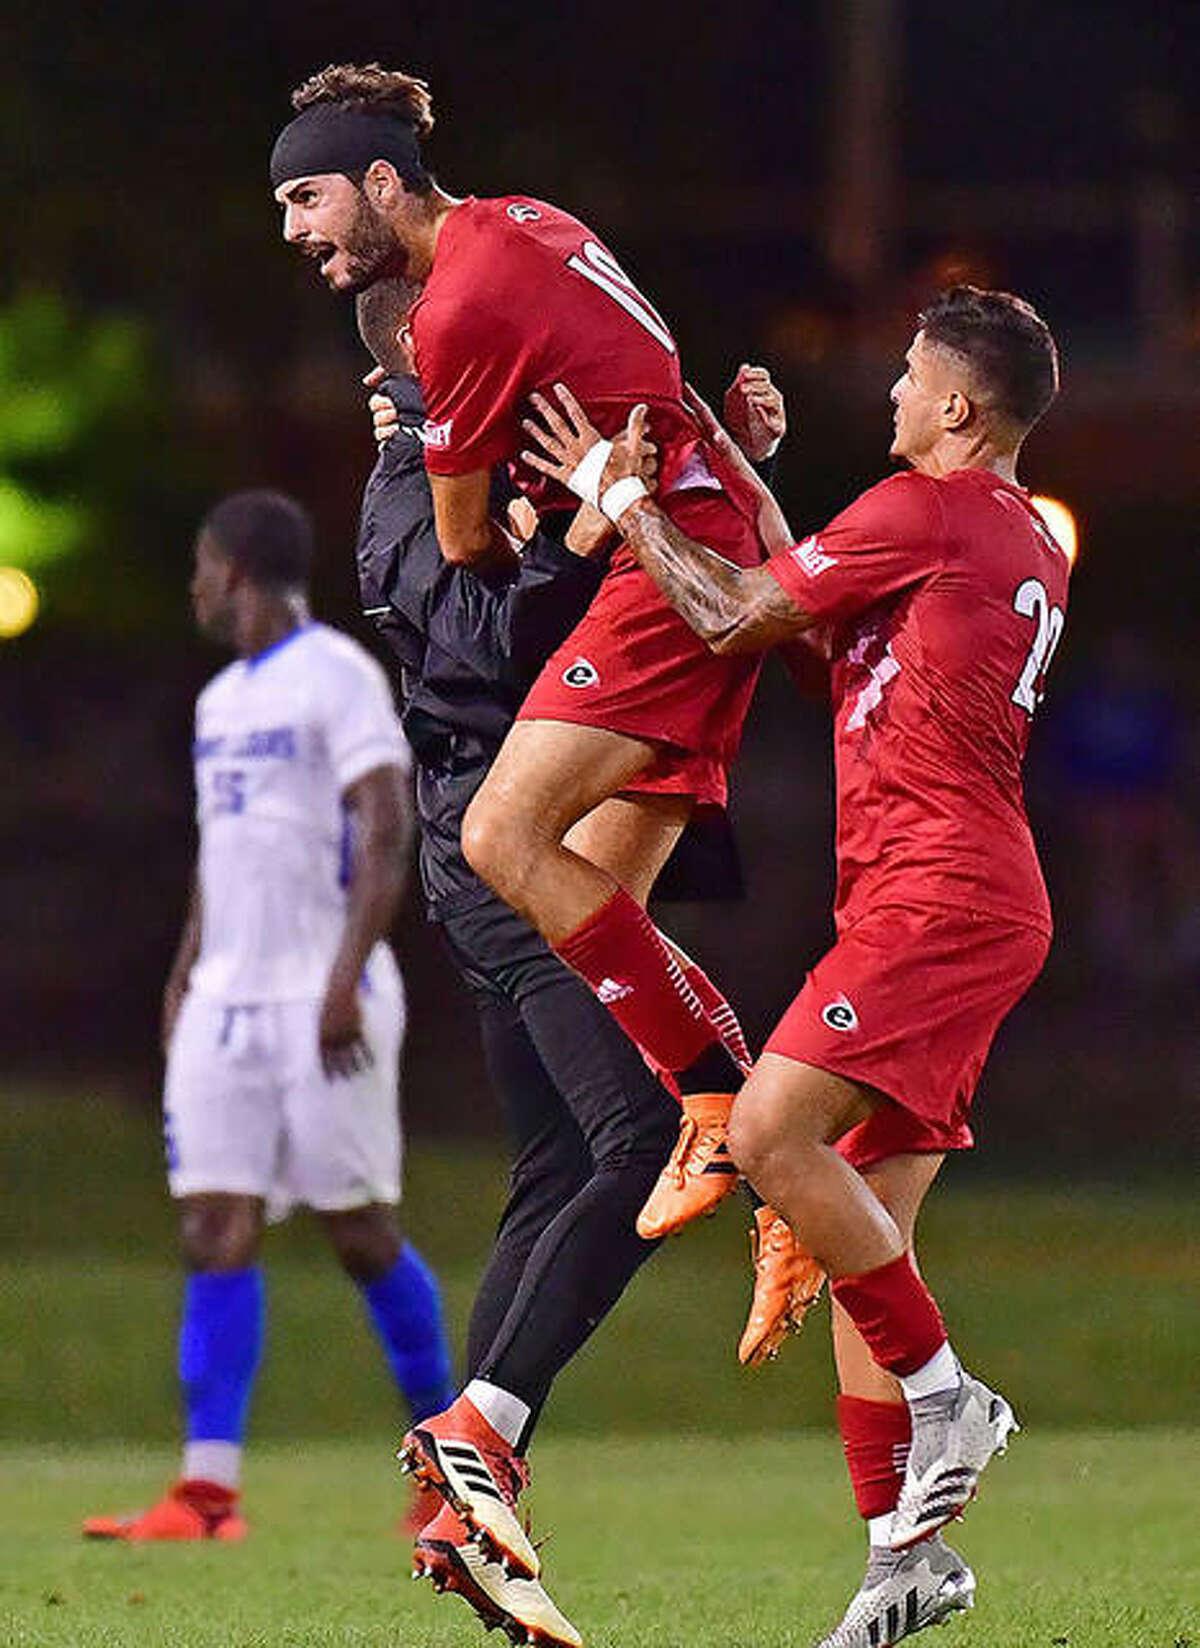 Paul Palacin, center, hugs an SIUE teammate after scoring late in Monday's Bronze Boot 1-1 tie with Saint Louis University at Hermann Stadium.